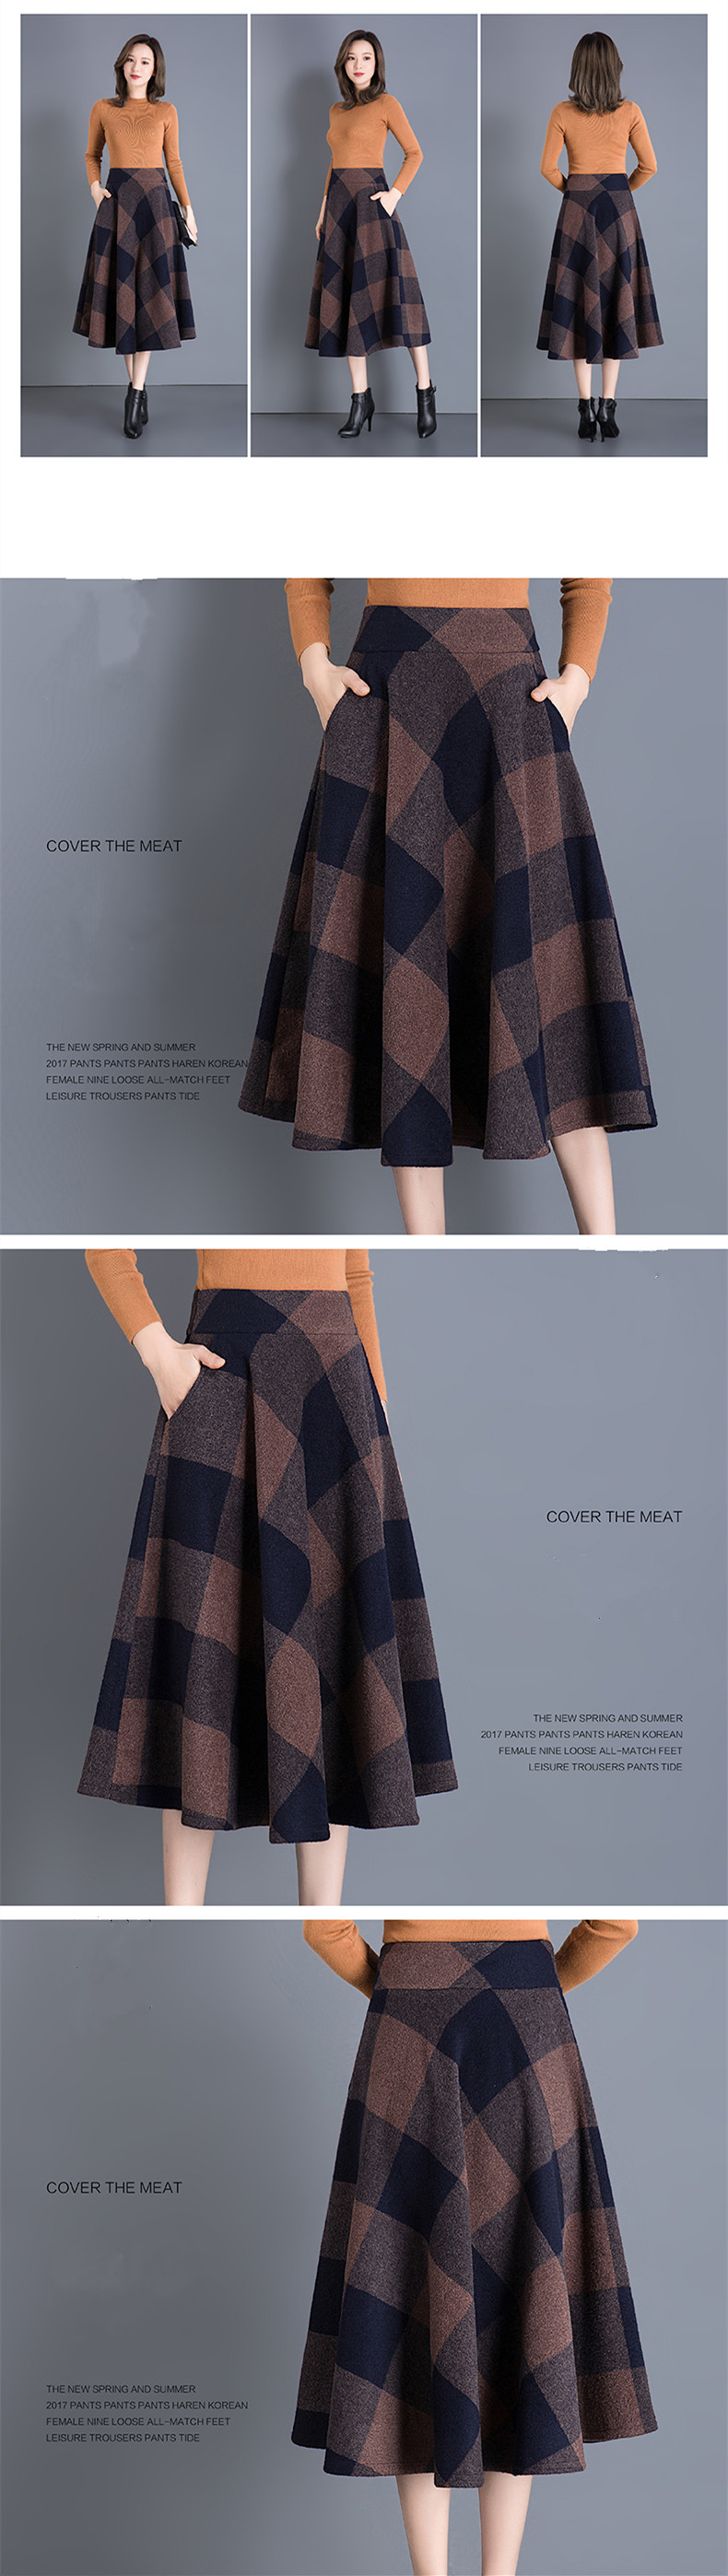 4fd6902fc6 Detail Feedback Questions about Vintage Plaid Skirt Women Autumn ...